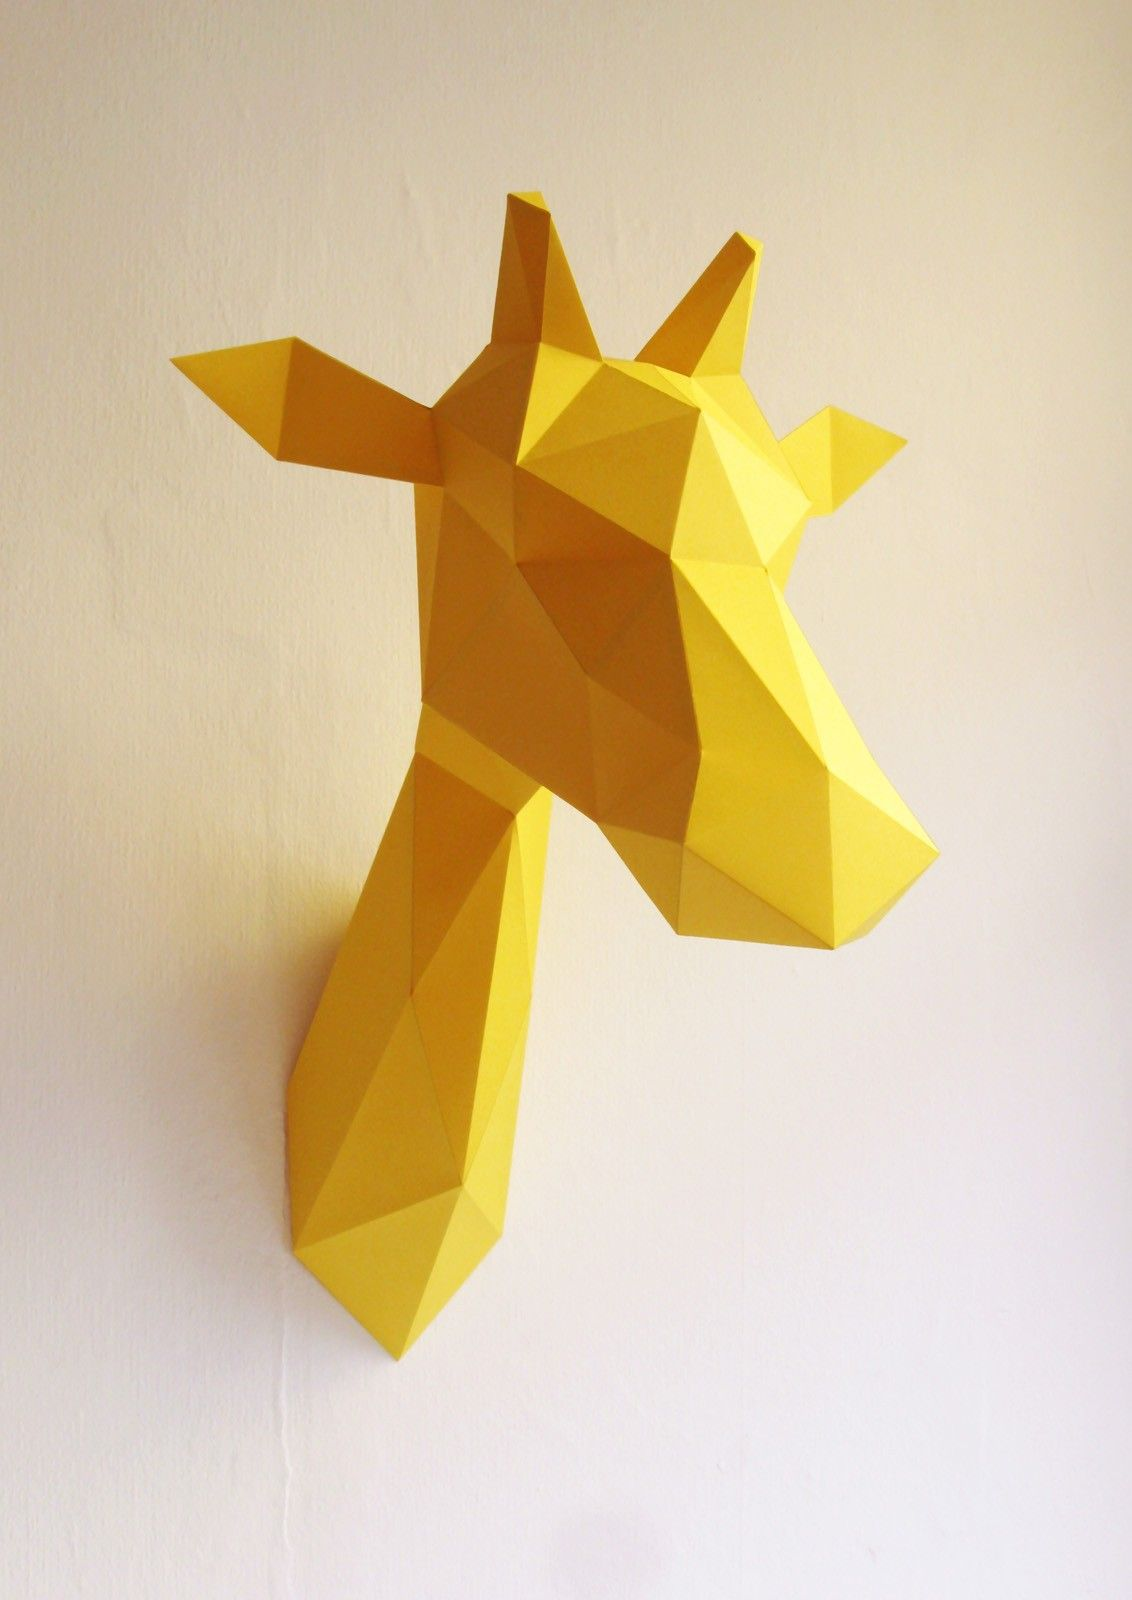 Origami En Papier Tete De Girafe Jaune